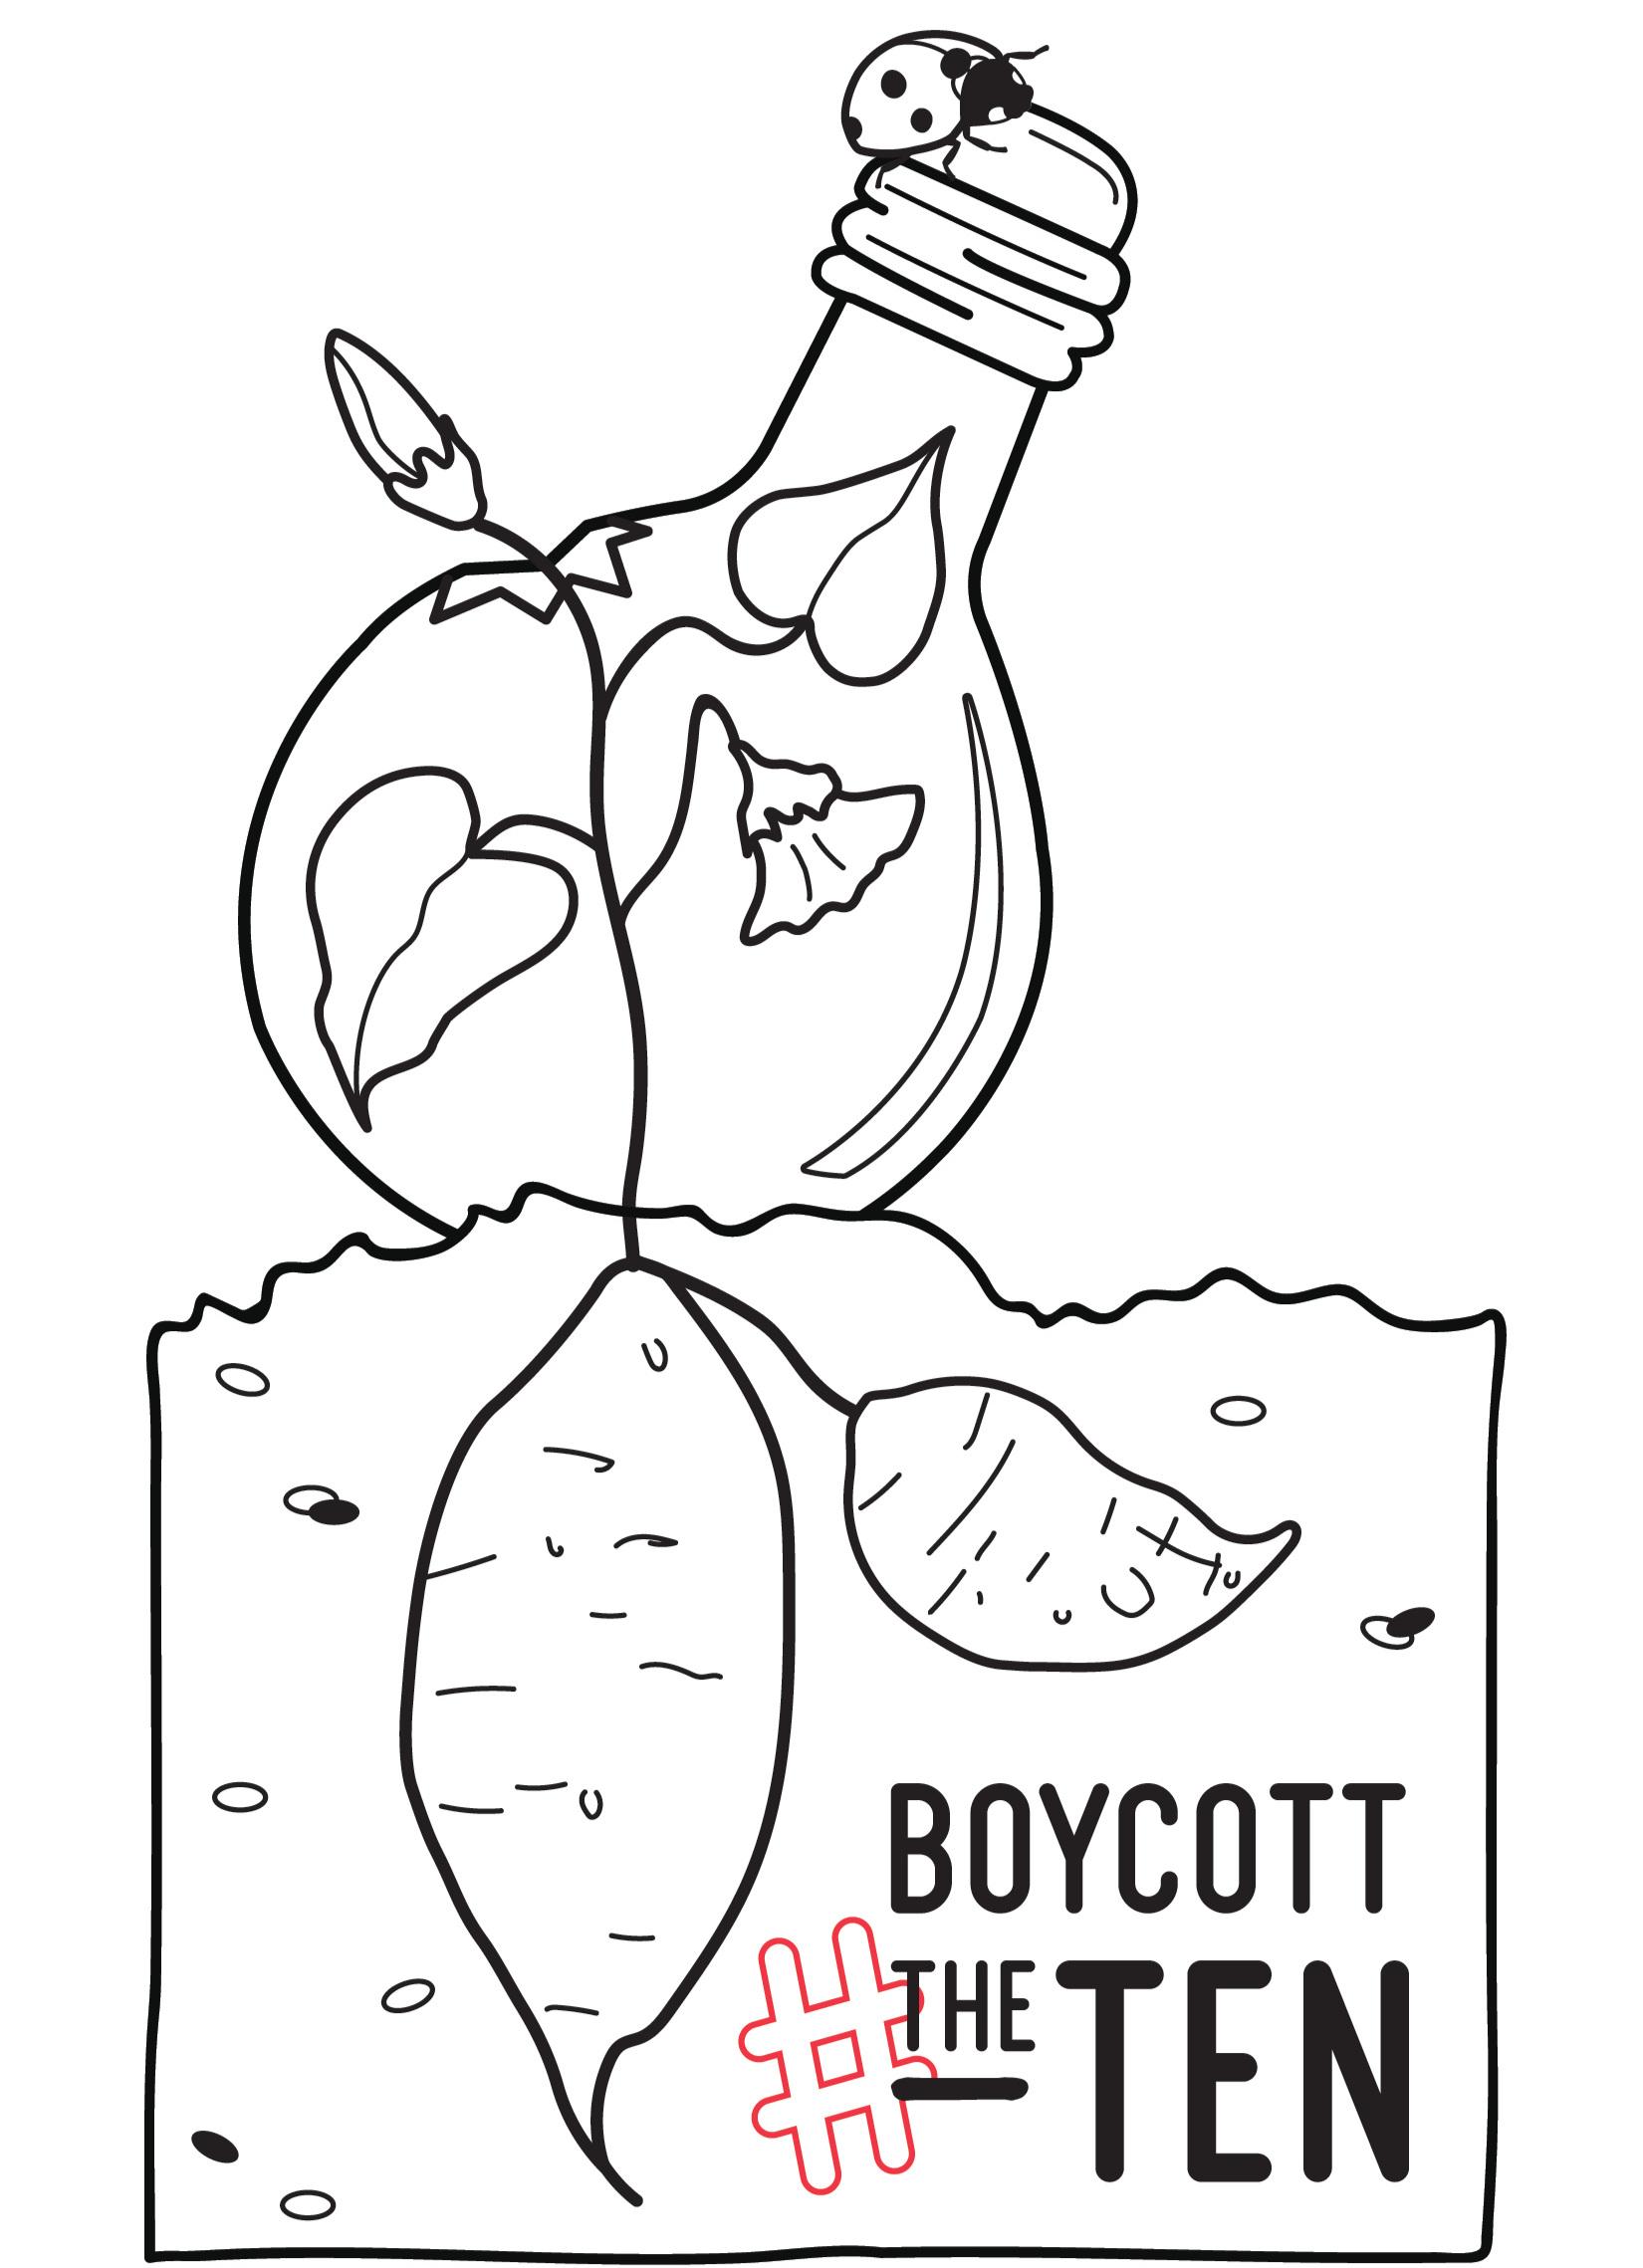 #BoycottTheTen - The Working-class and Homeless Organizing Alliance (WHOA) Boycott & Greensboro DSA